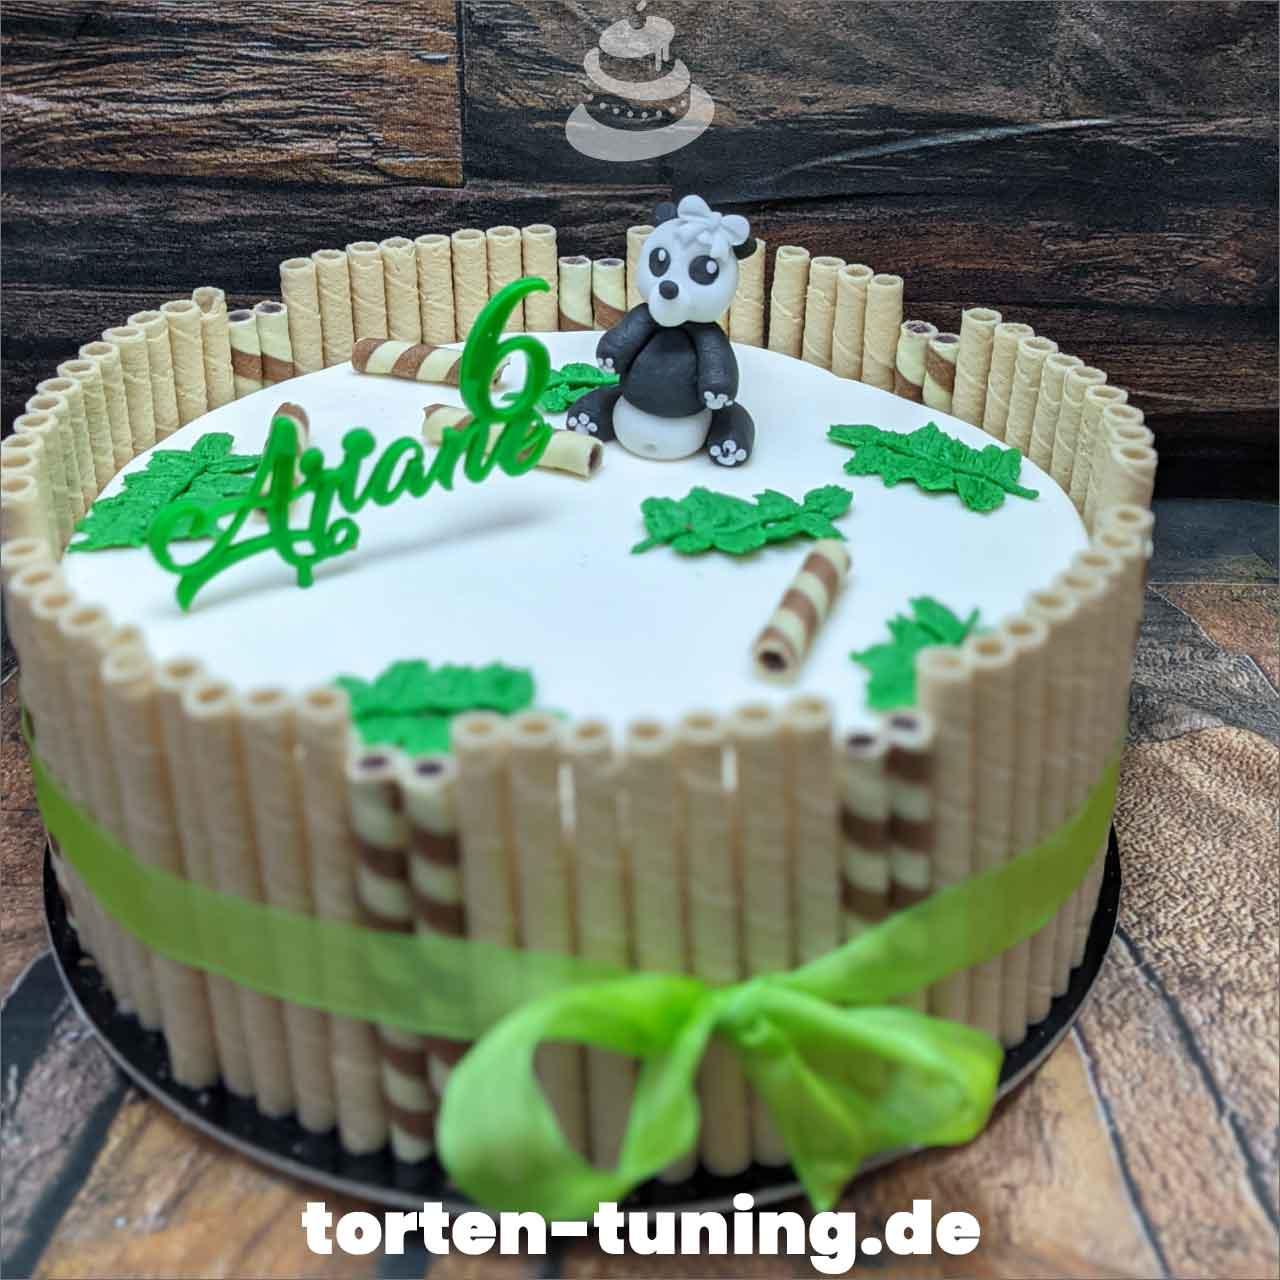 Panda Torte Bambus Dripcake Obsttorte Geburtstagstorte Motivtorte Torte Tortendekoration Torte online bestellen Suhl Thüringen Torten Tuning Sahnetorte Tortenfiguren Cake Topper